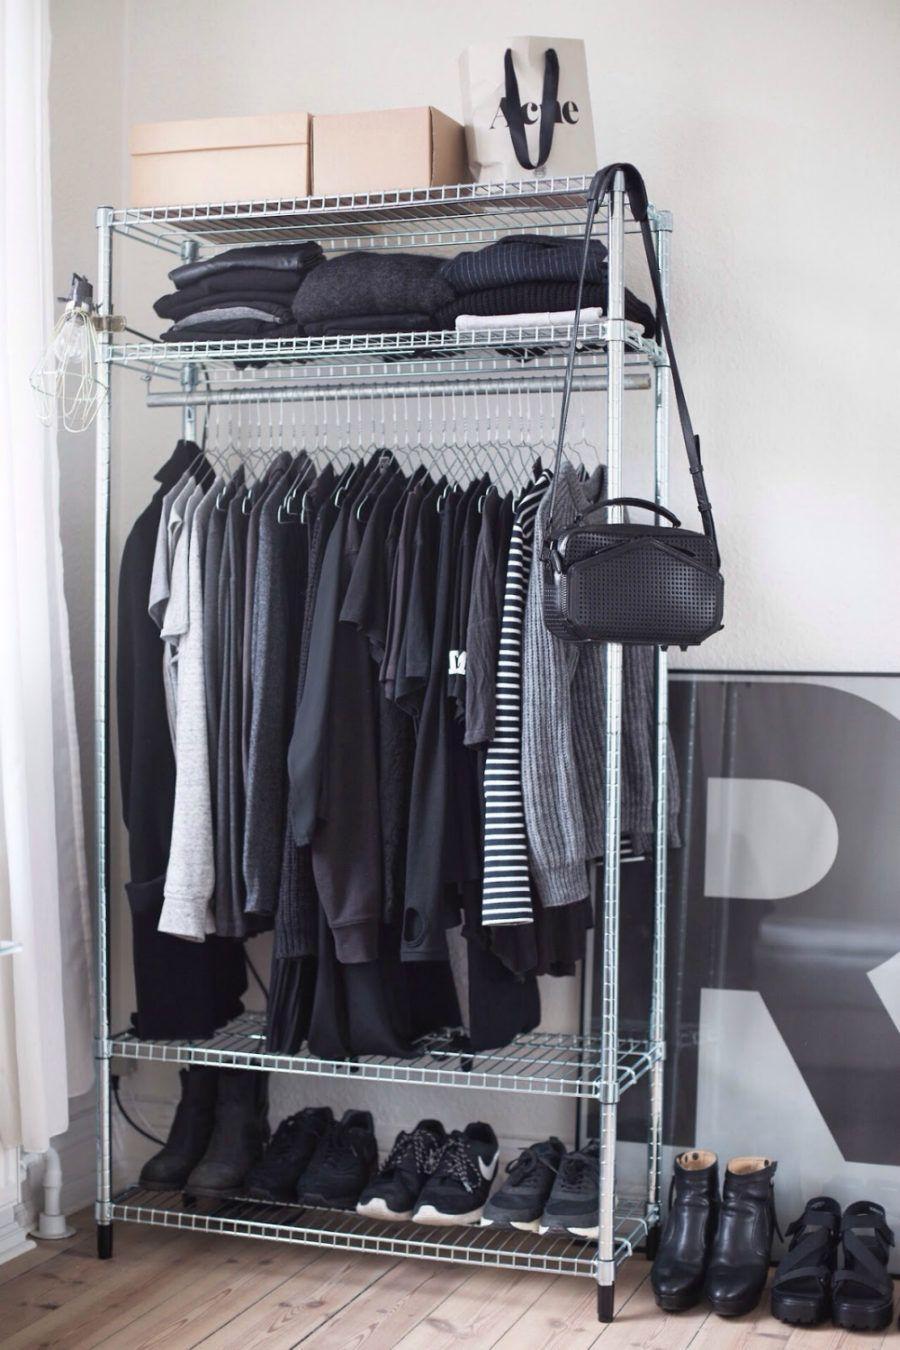 Http://shoproomideas.com/wp Content/uploads/2017/02/diy Open Concept Closet  Cothing Rack Wardrobe Display Modern Chic Minimalist Design Feminine Meu2026